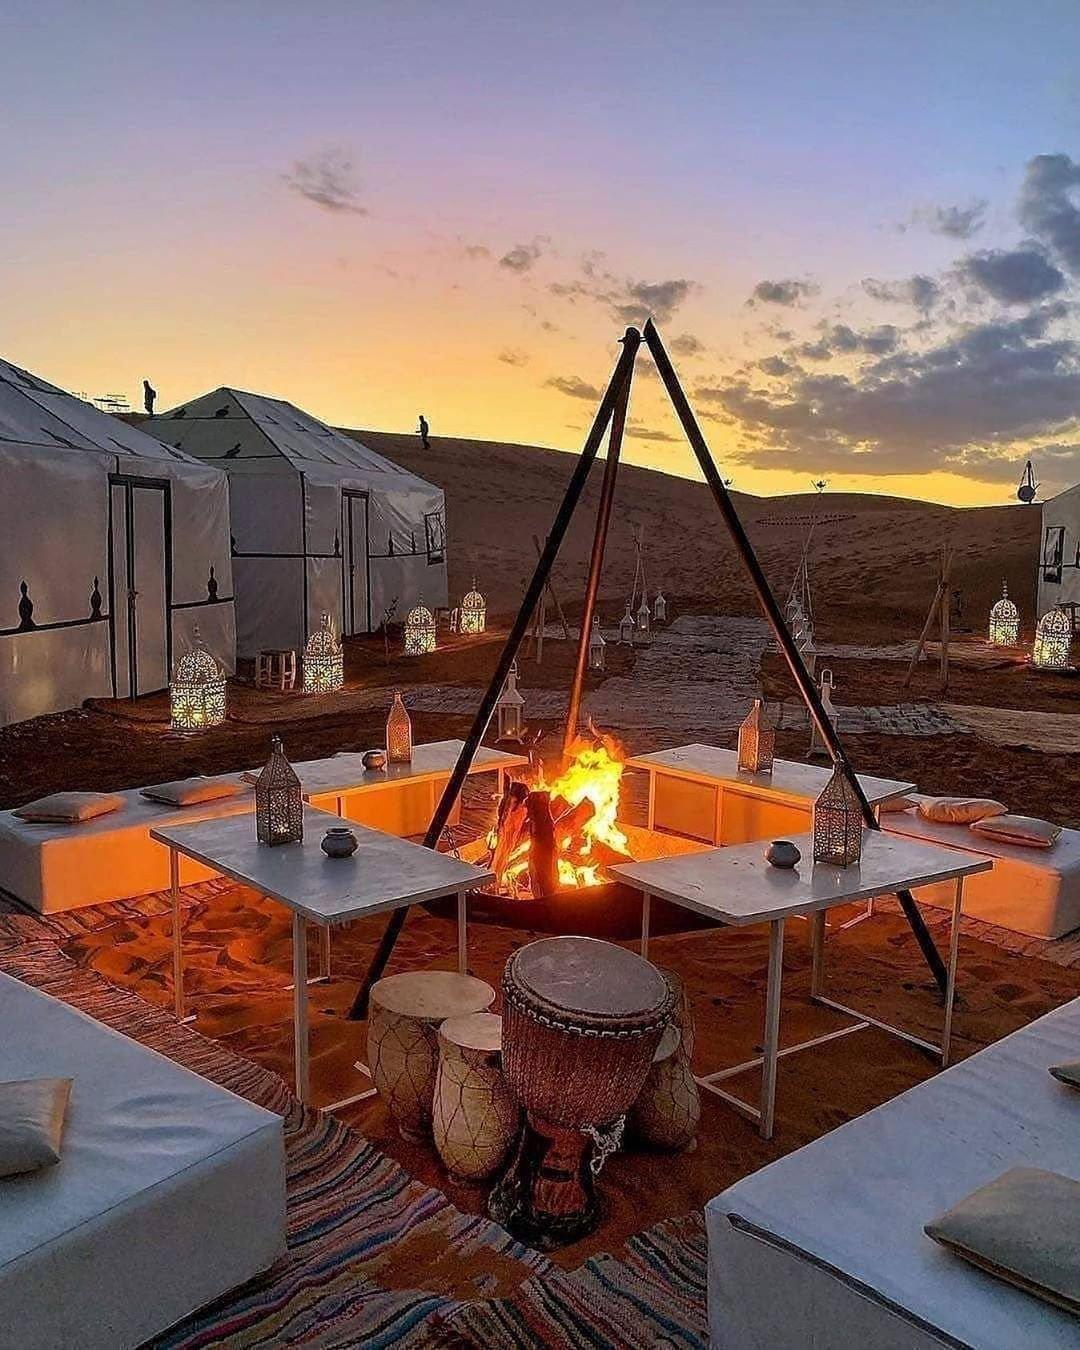 sahara desert camp, 4 days from marrakech to merzouga, marrakech desert tours, merzouga tour, voyager a merzouga,